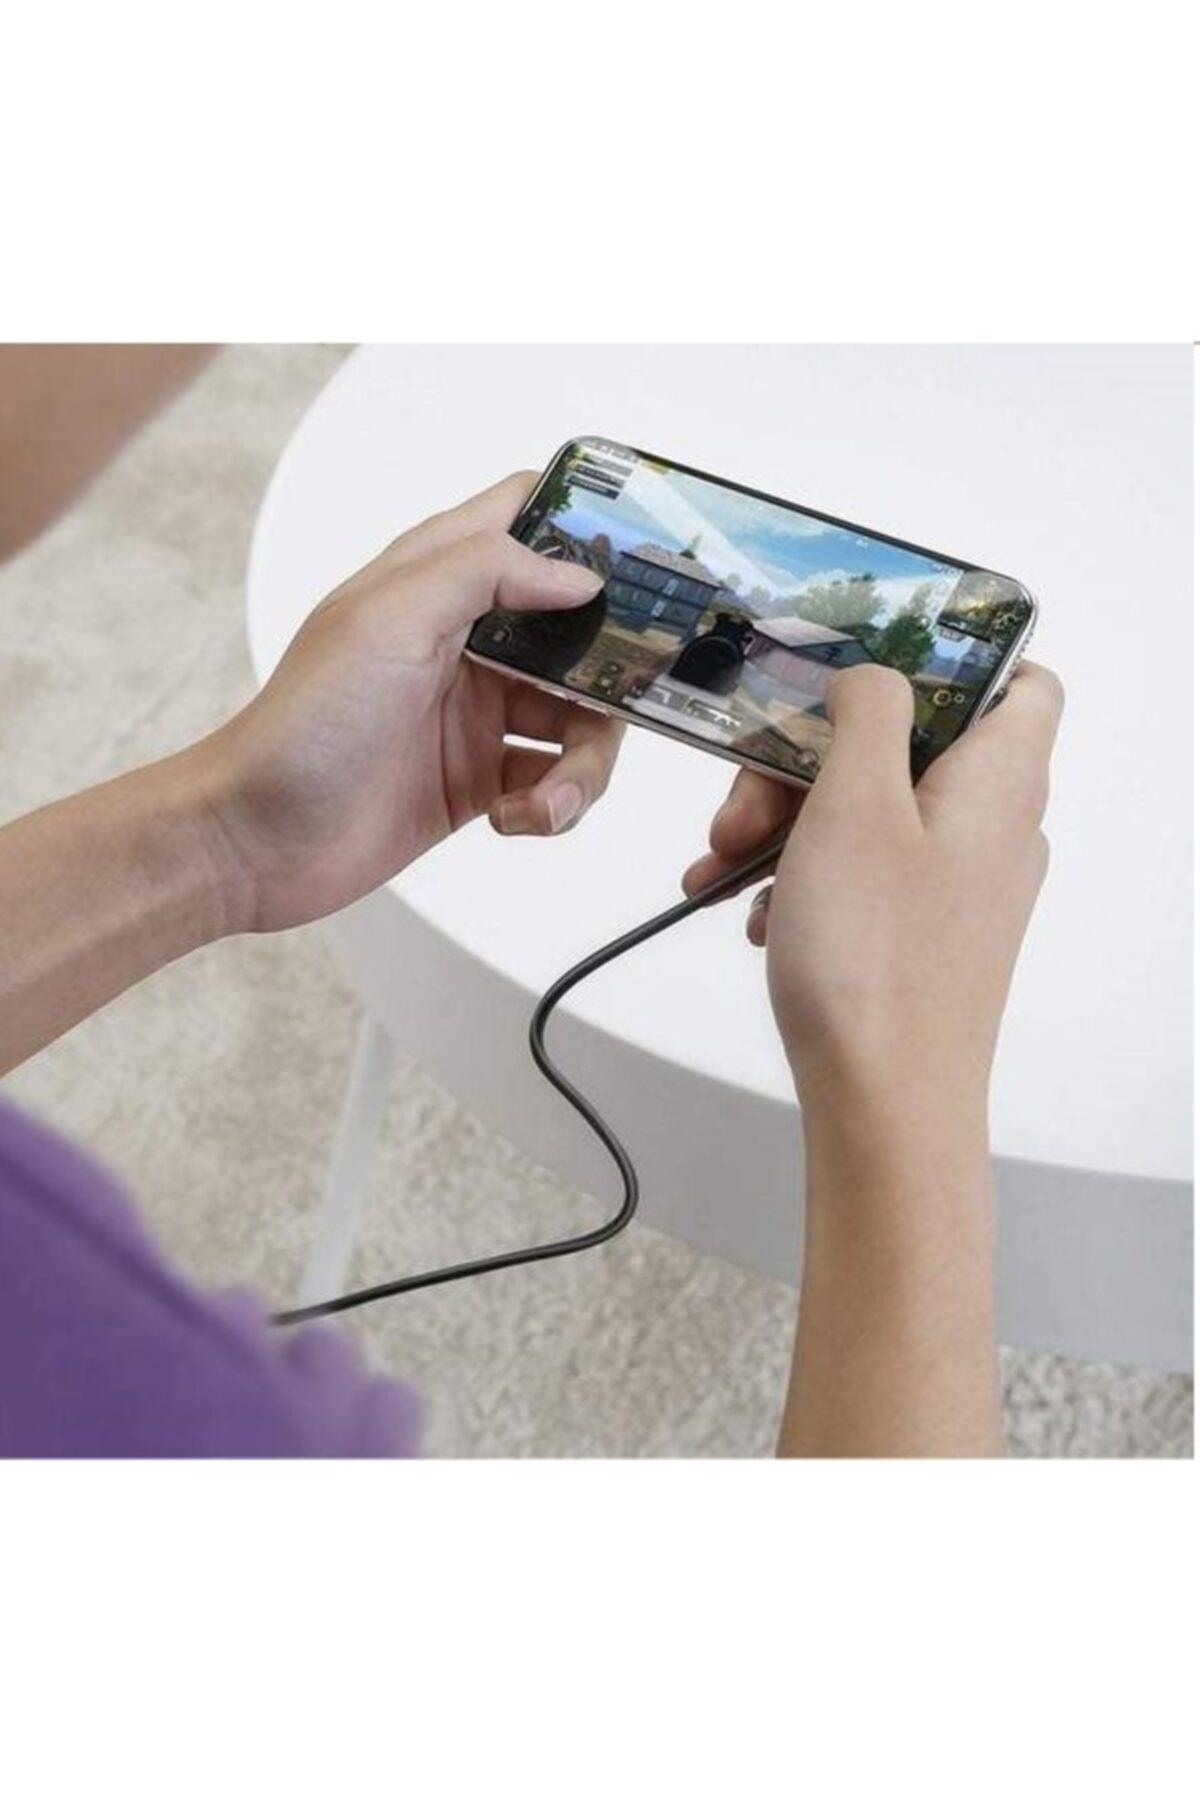 POWERWAY 3.1 A Hızlı Şarj Pubg Mikro Gaming Oyuncu Hızlı Şarj Kablosu 2